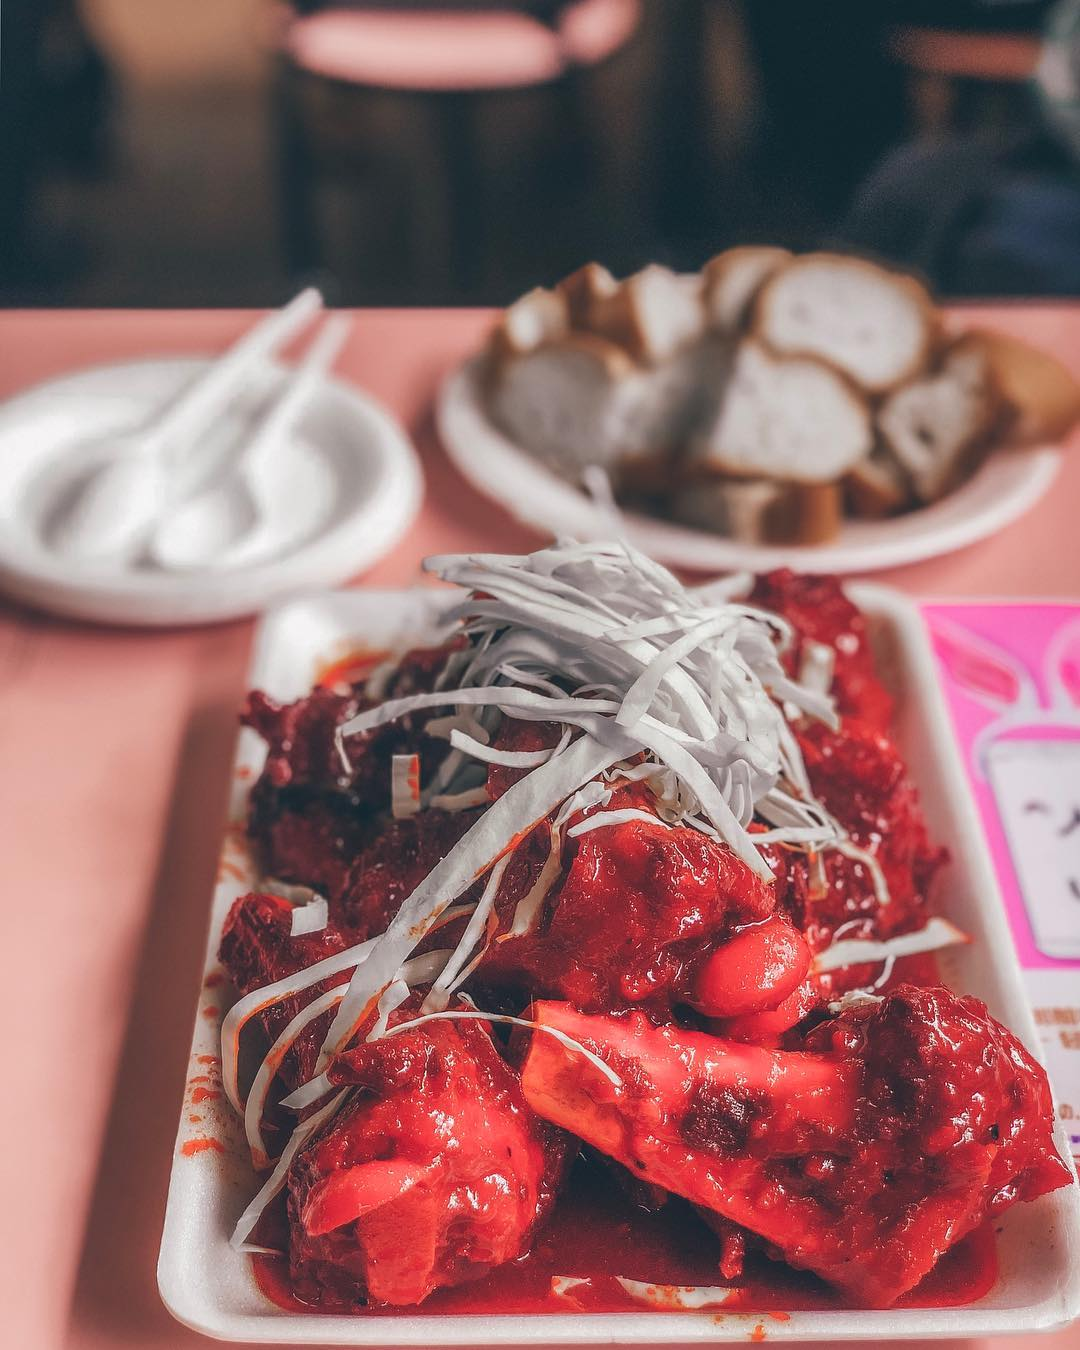 Kuliner Halal Kampong Glam